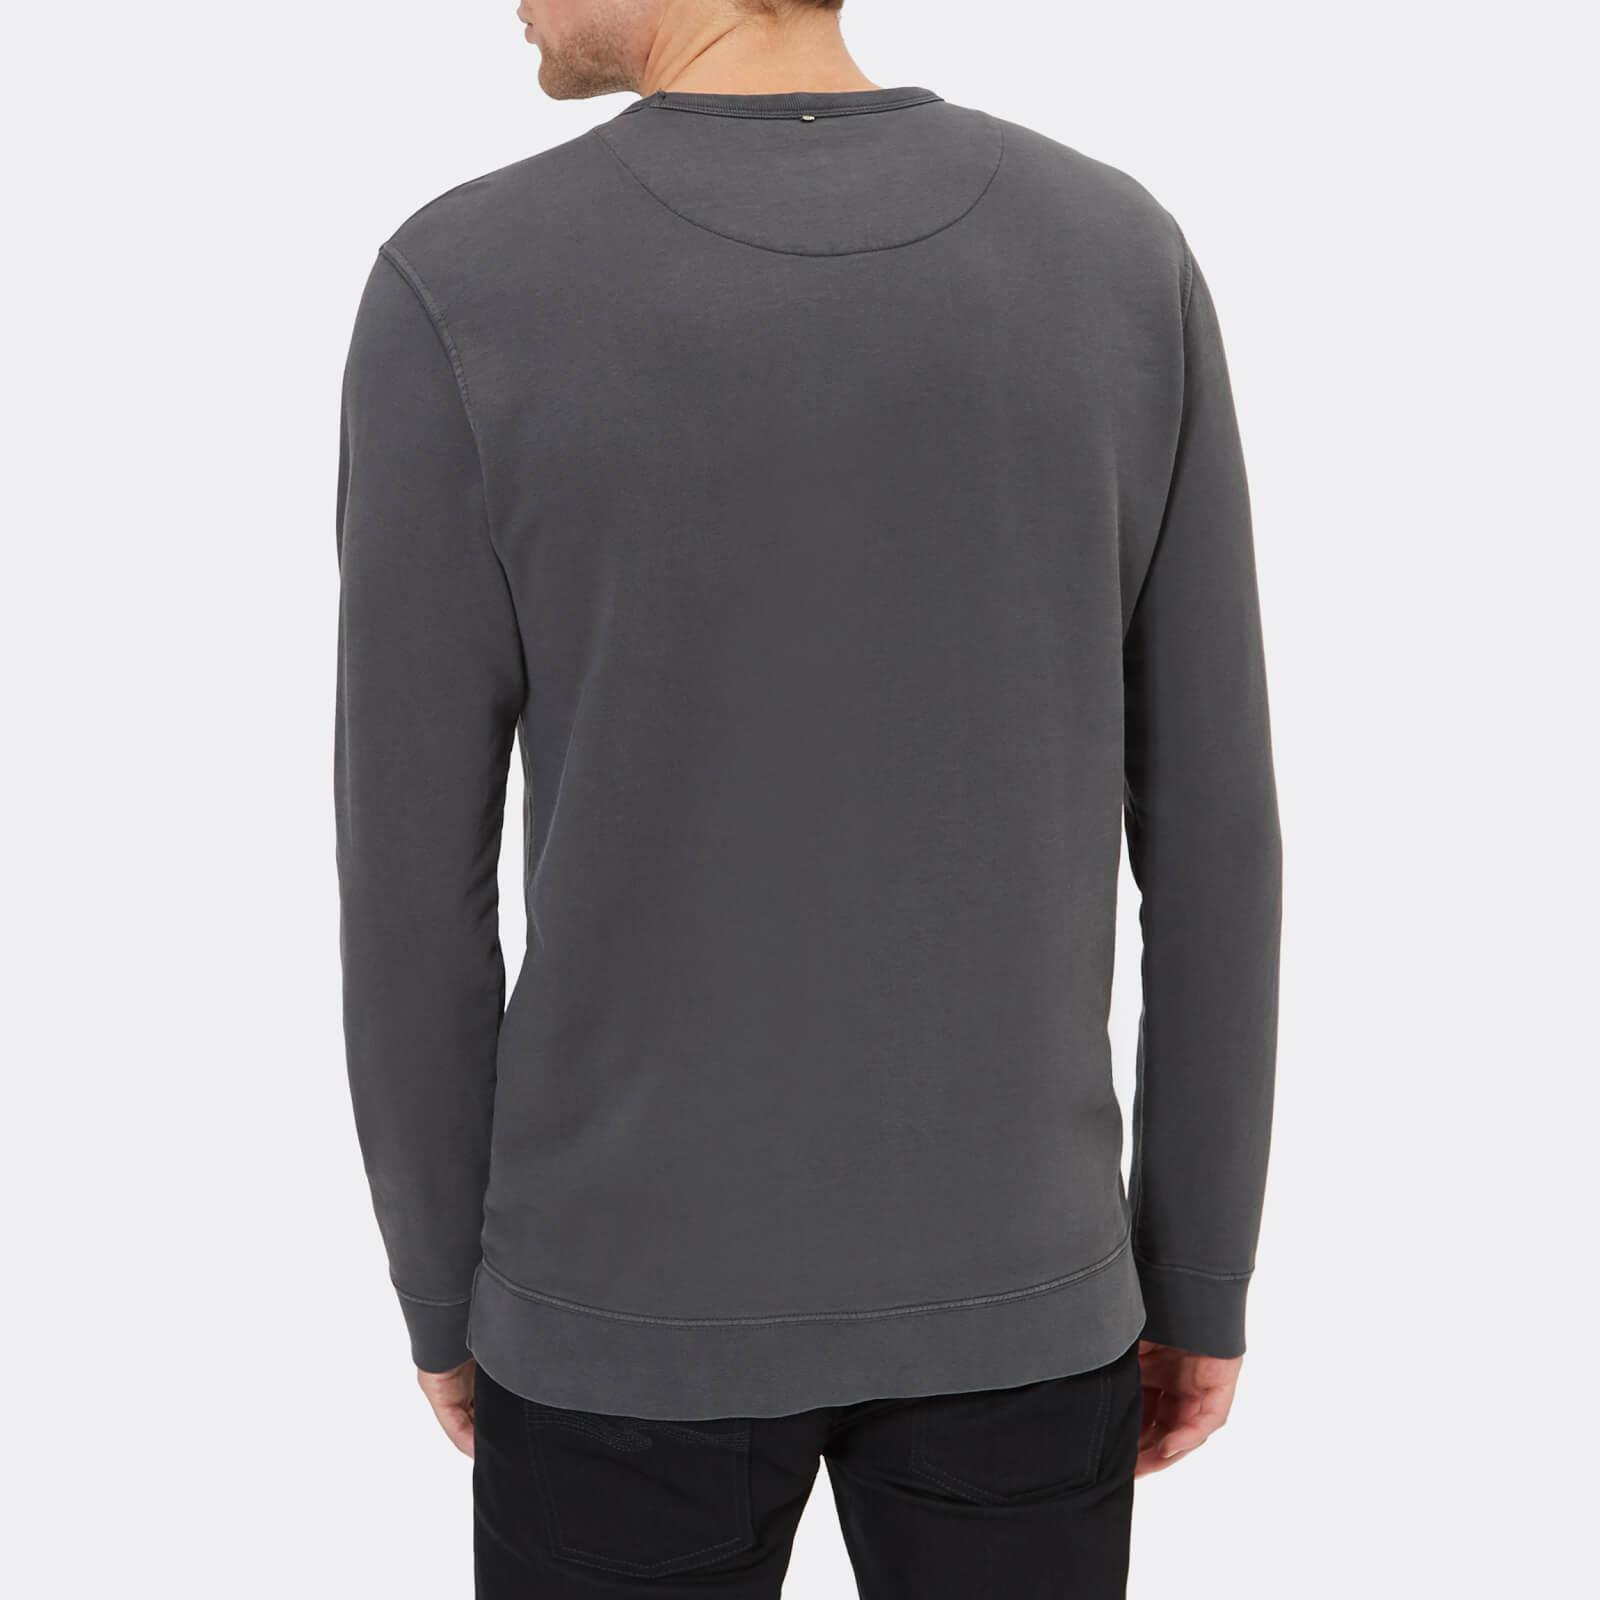 Men For Sweatshirt Havelock Gray Lyst Pretty Green In Applique wqYxtT0